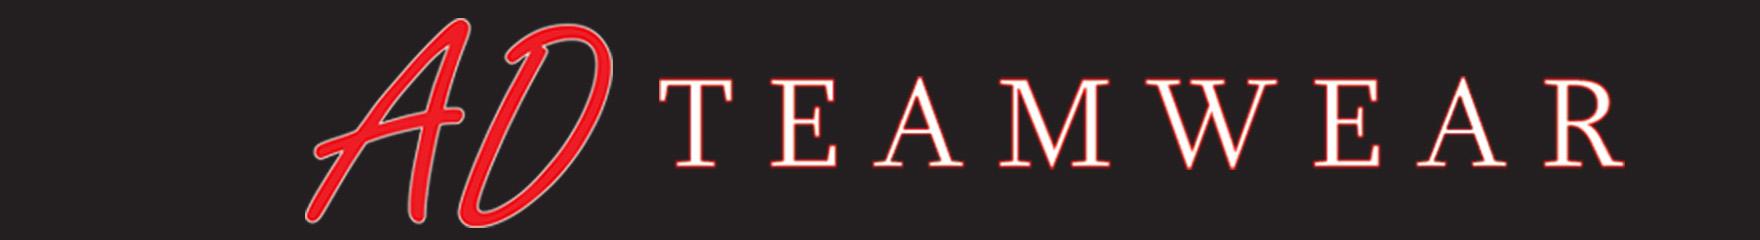 AD Teamwear Banner Retina